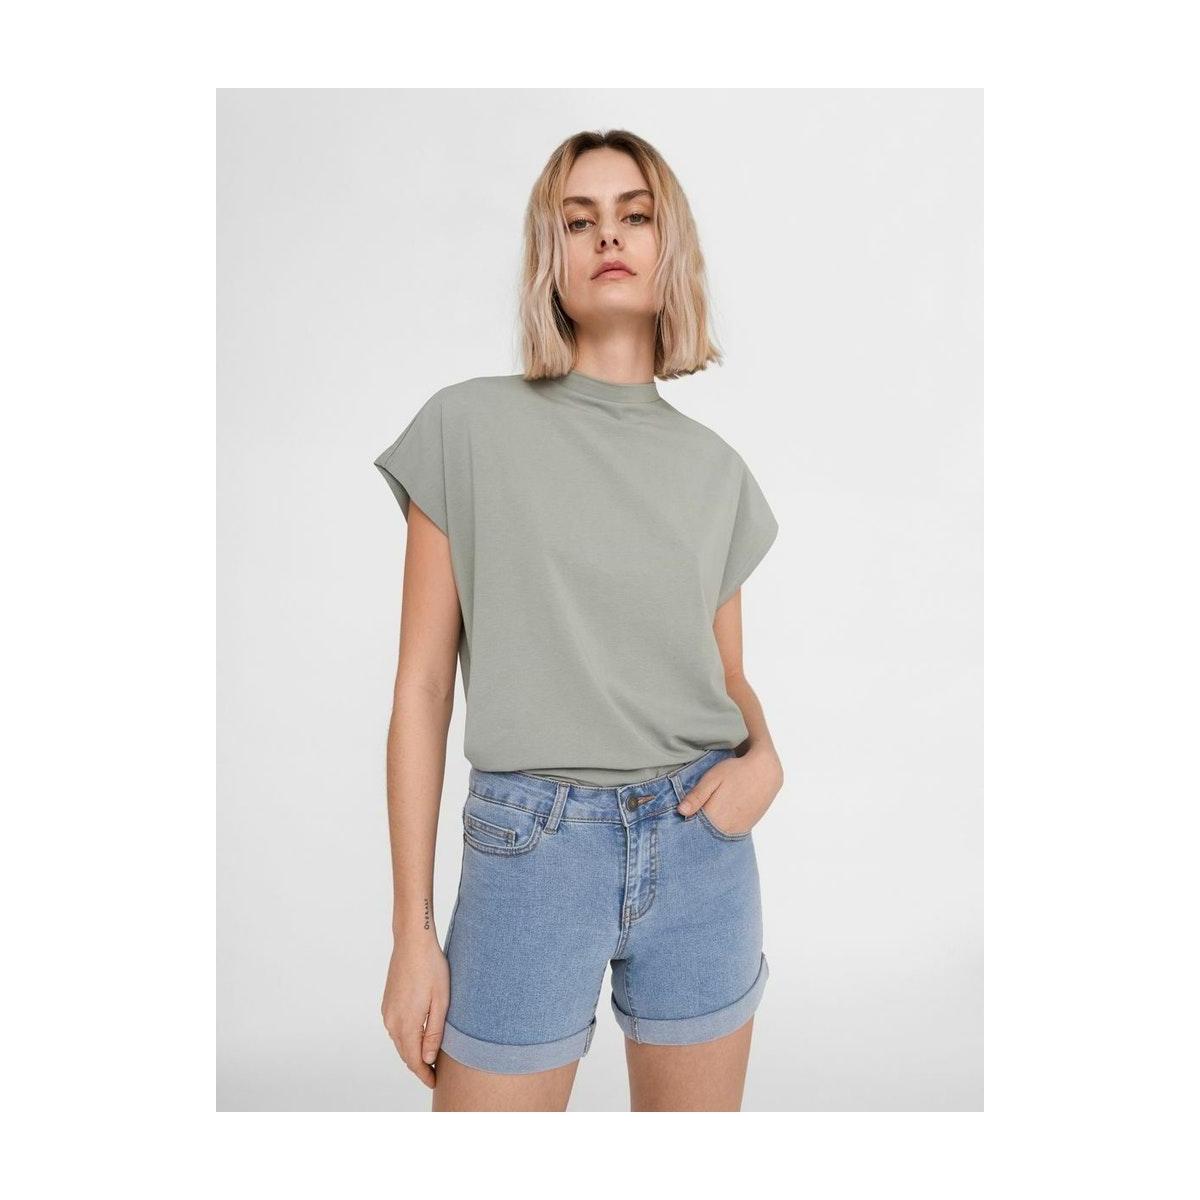 nmbe lucy nw den fold shorts gu818 27001243 noisy may korte broek light blue denim